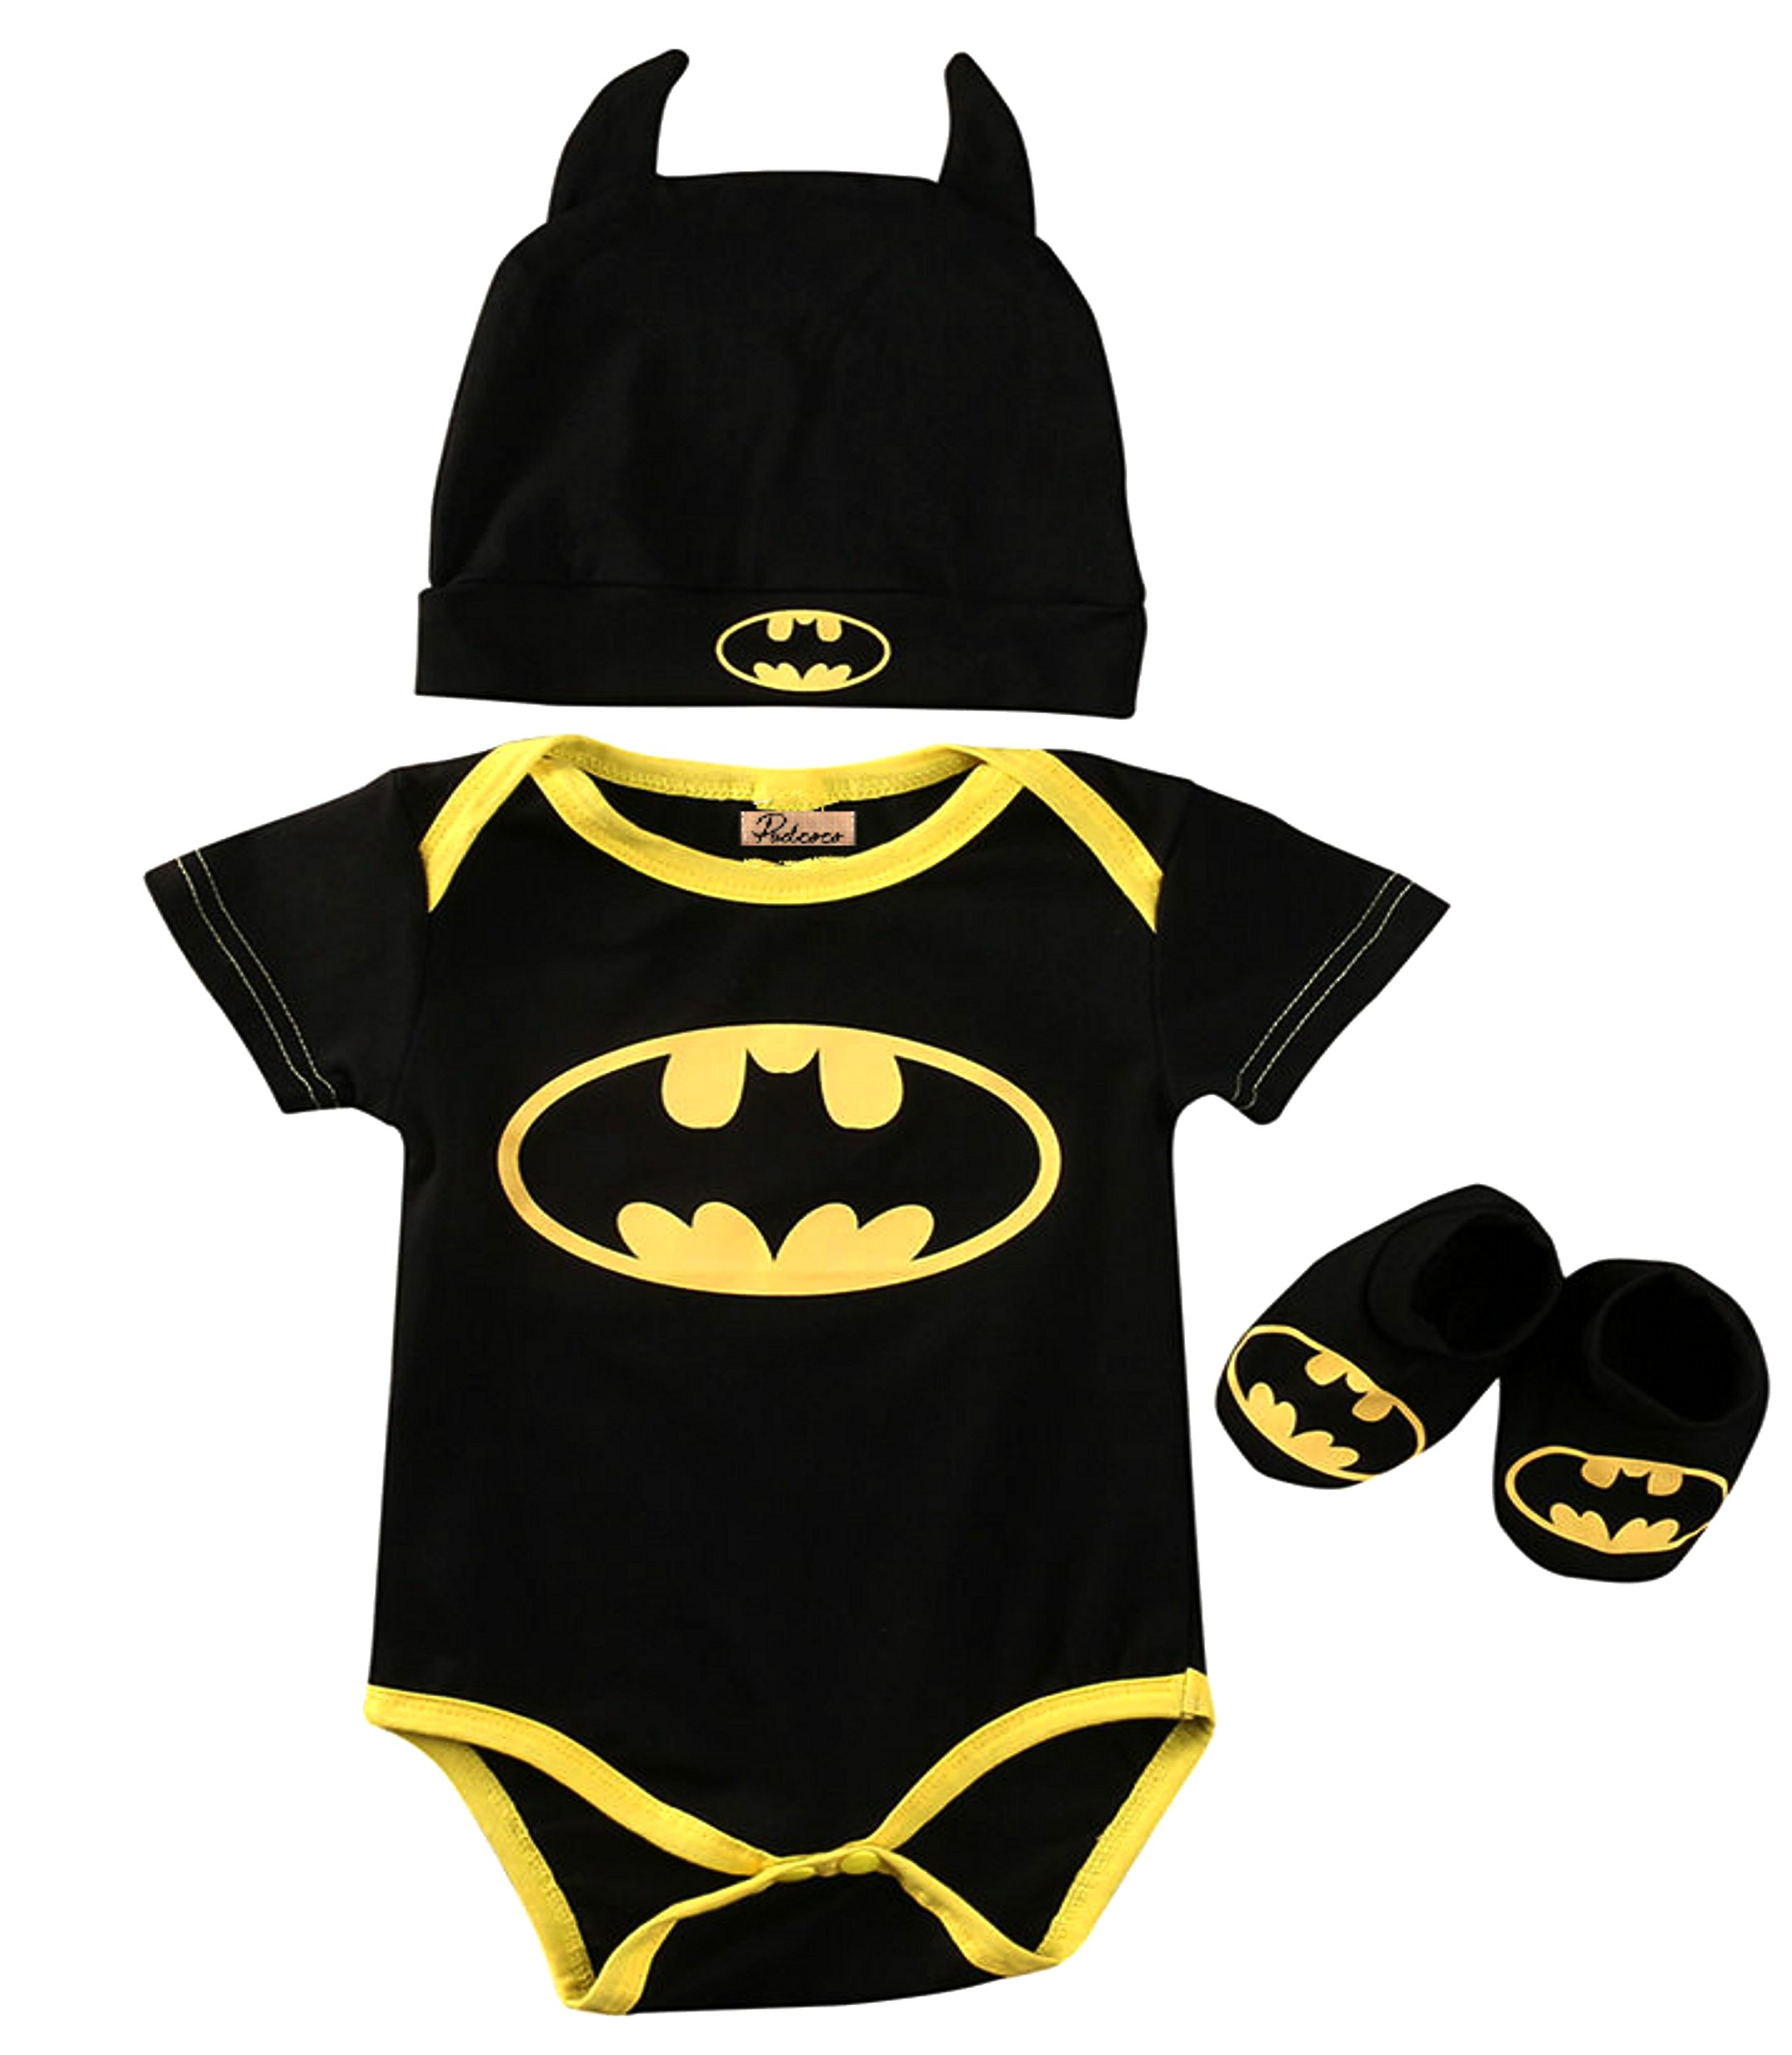 Baby Superhero Onesie: 3 Piece Outfits Set (0-6 Months, Batman Short Sleeves)